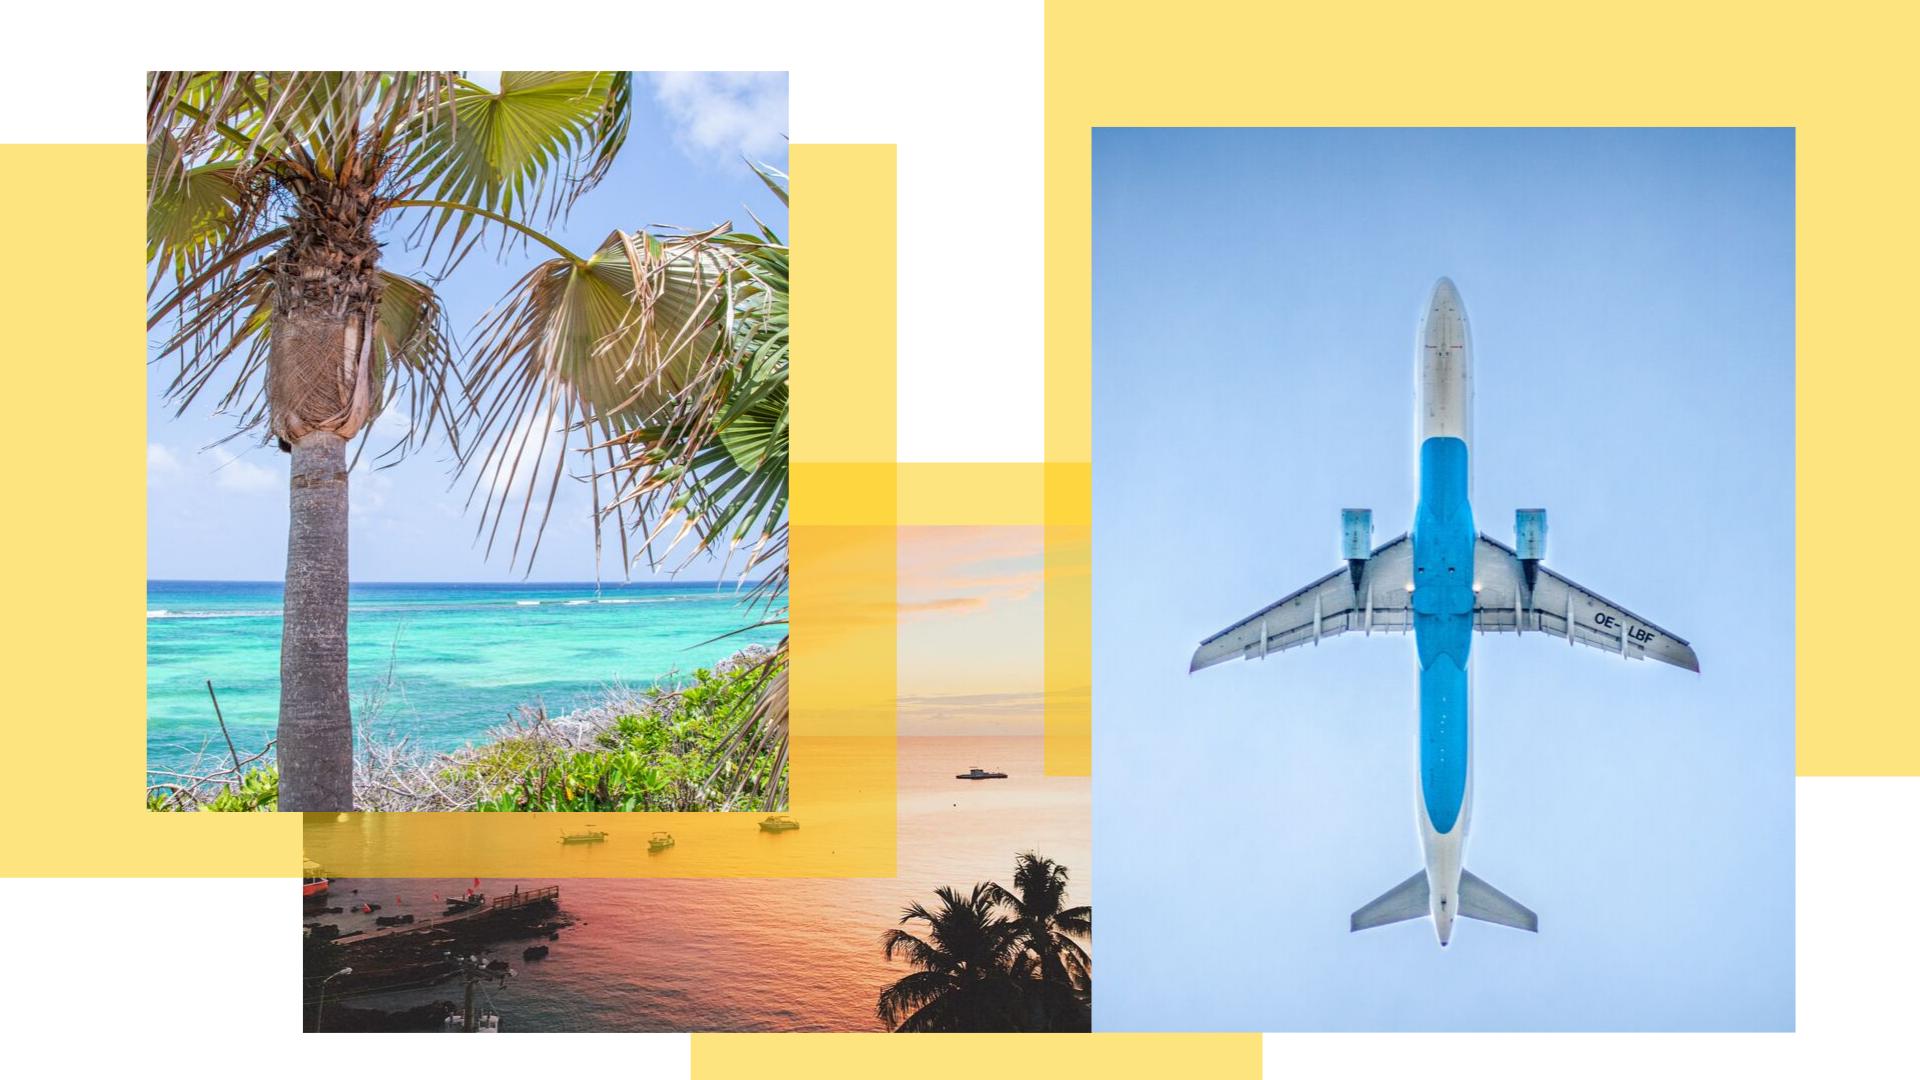 NBAA-BACE Cayman Enterprise City Aviation Sector Businesses